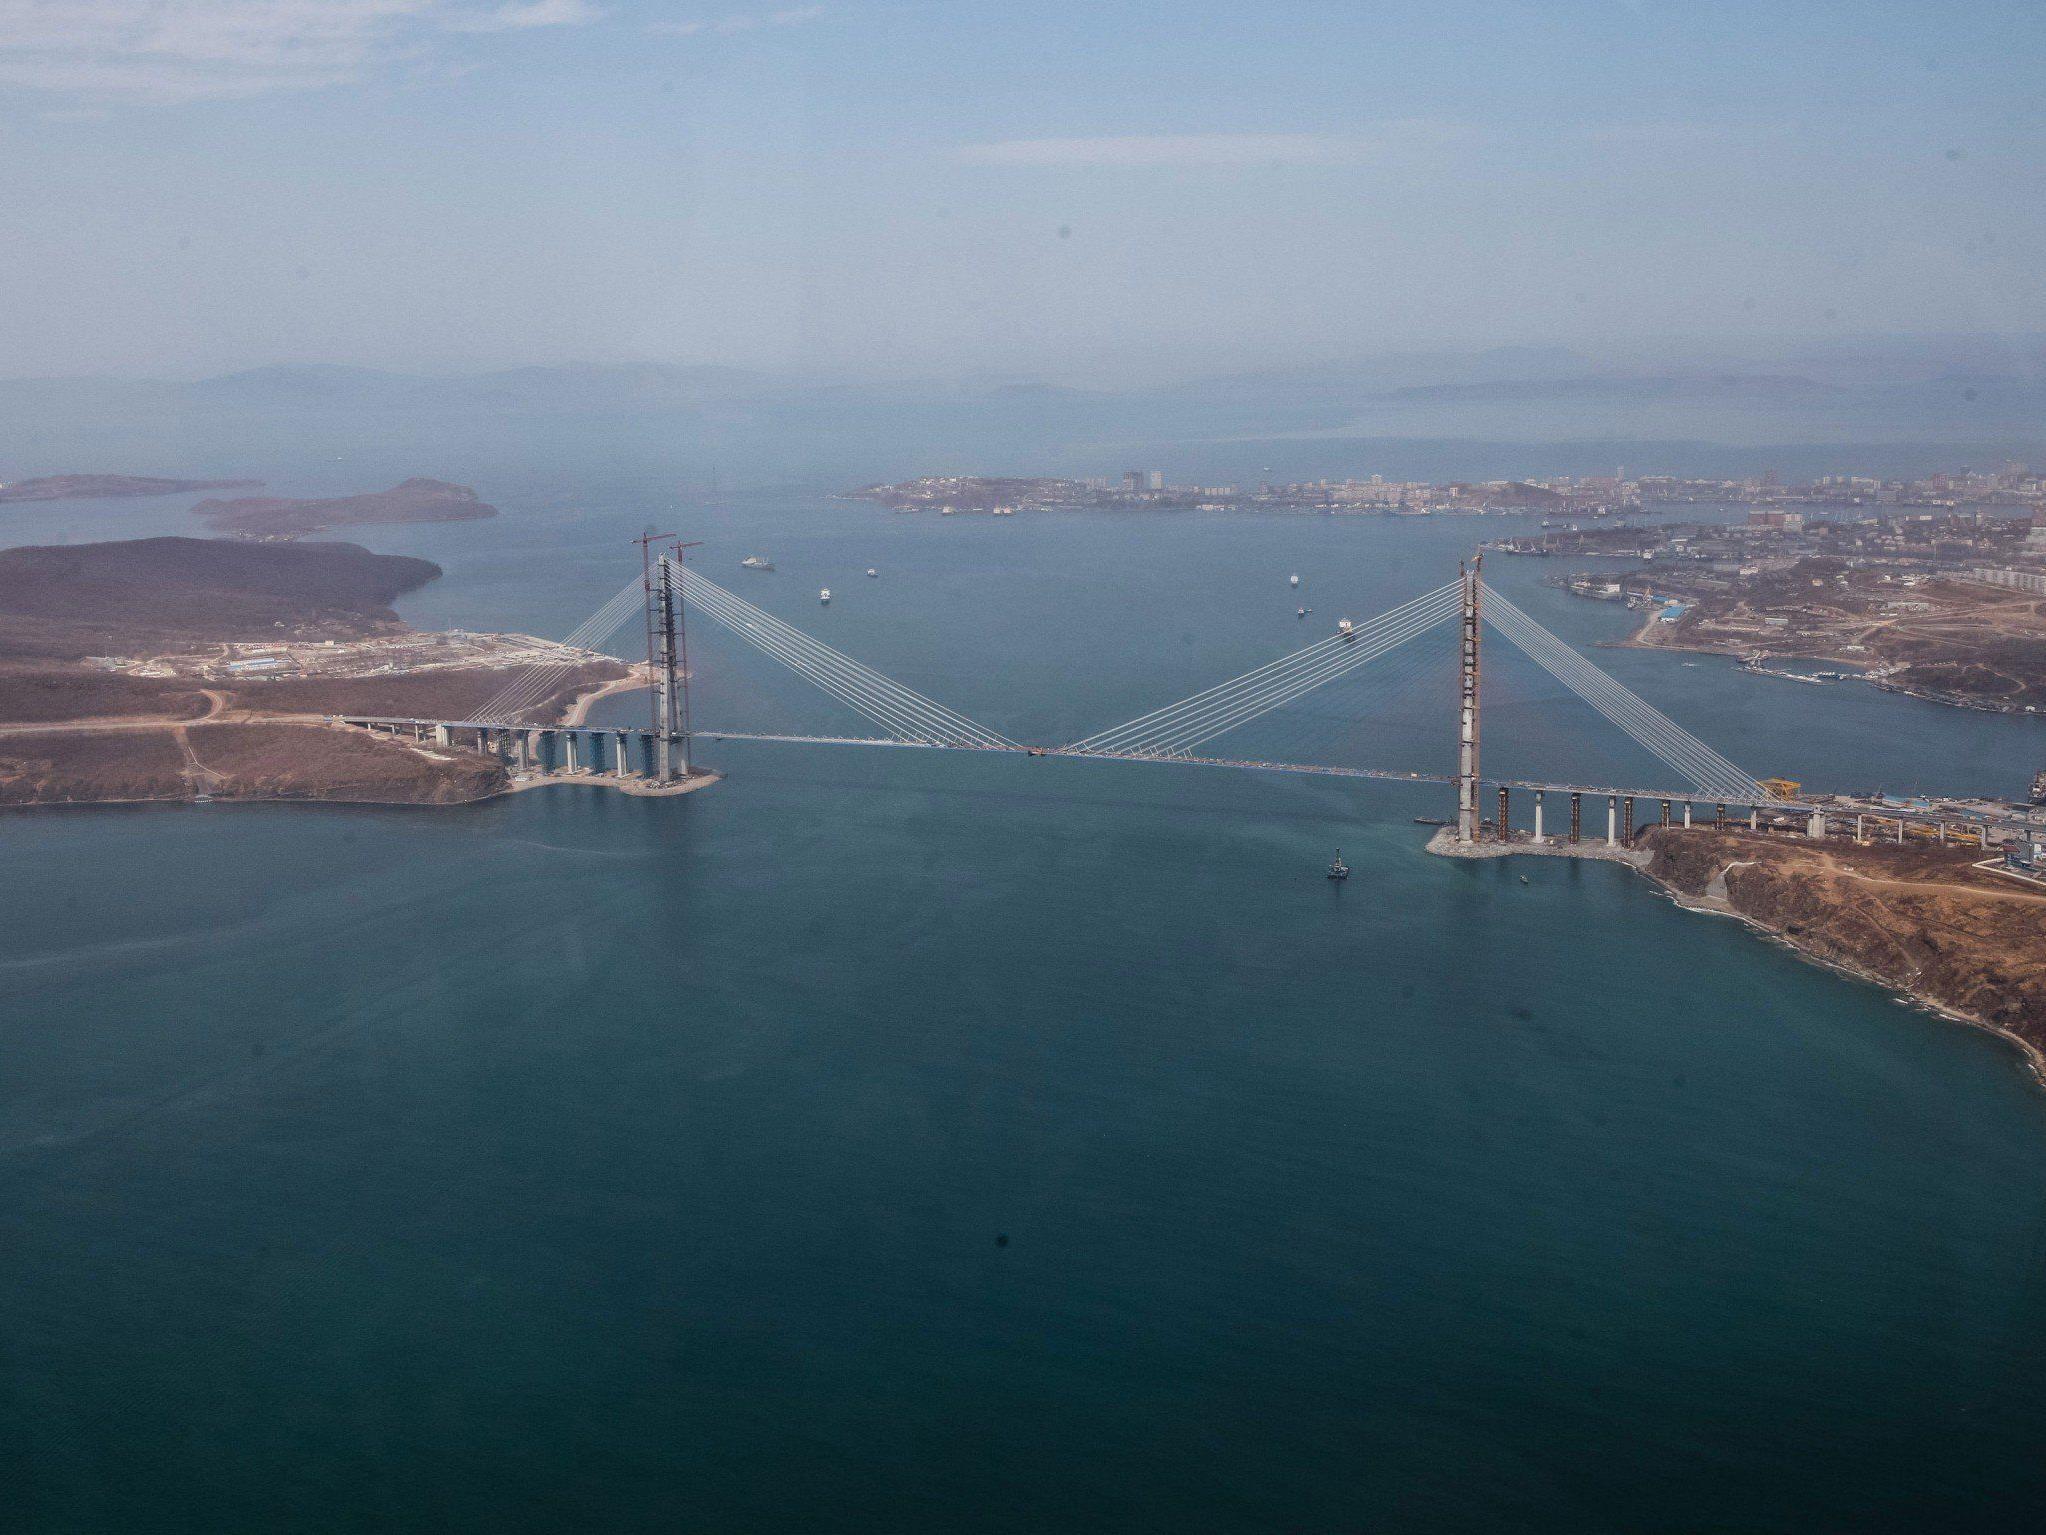 37-Jähriger überlebte 65 Meter tiefen Fall in den Bosporus.